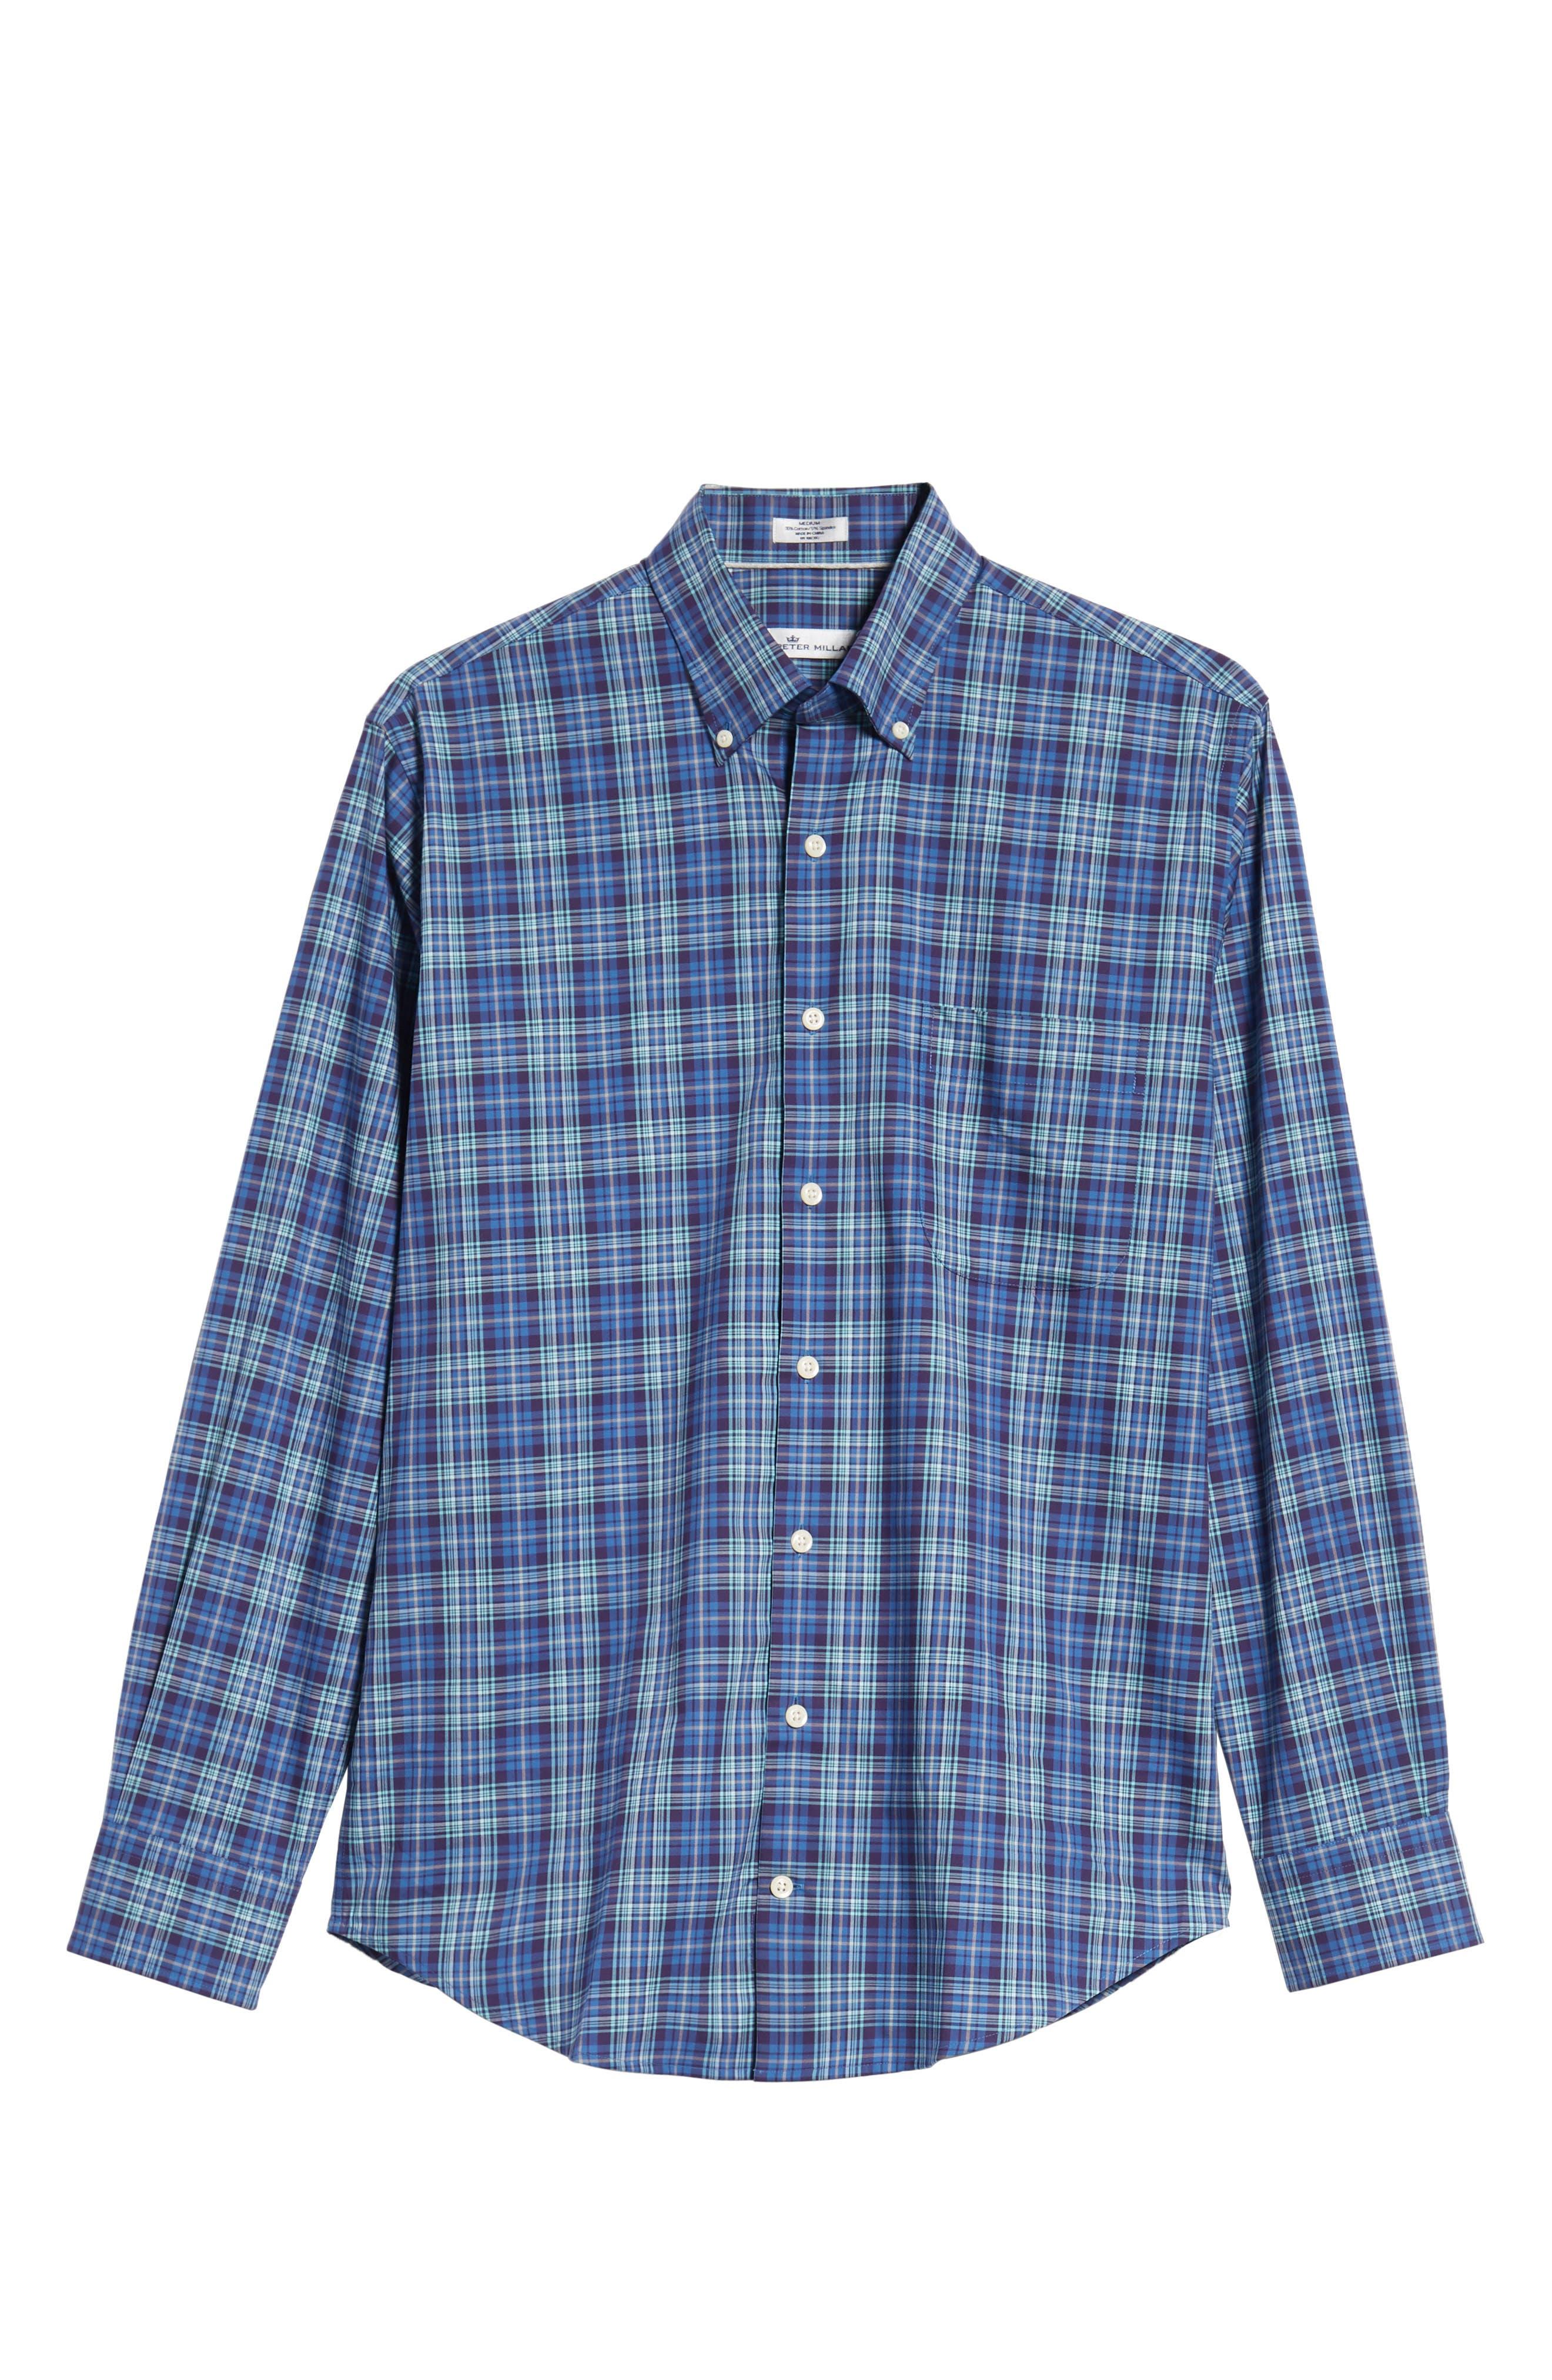 Crown Ease Flatey Island Regular Fit Tartan Plaid Sport Shirt,                             Alternate thumbnail 5, color,                             BLUE